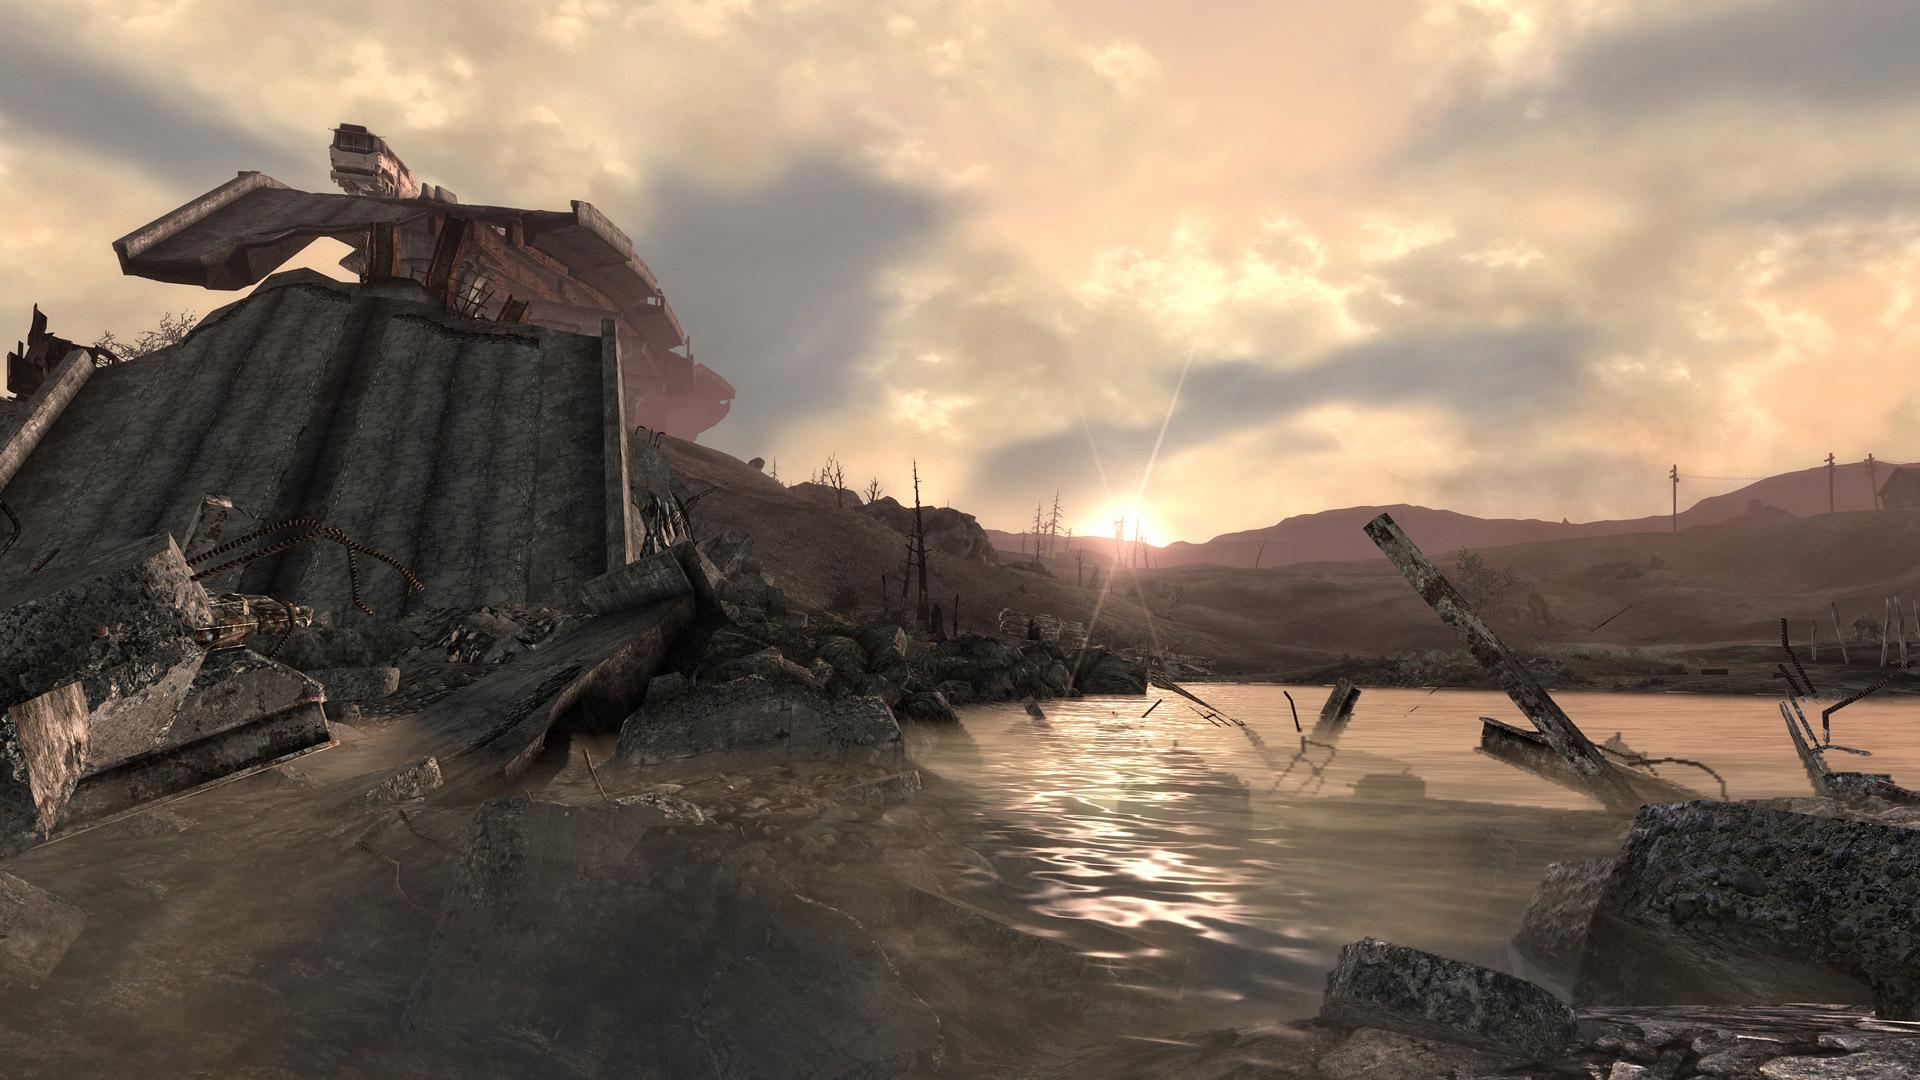 Fallout 3 Wallpaper in 1920x1080